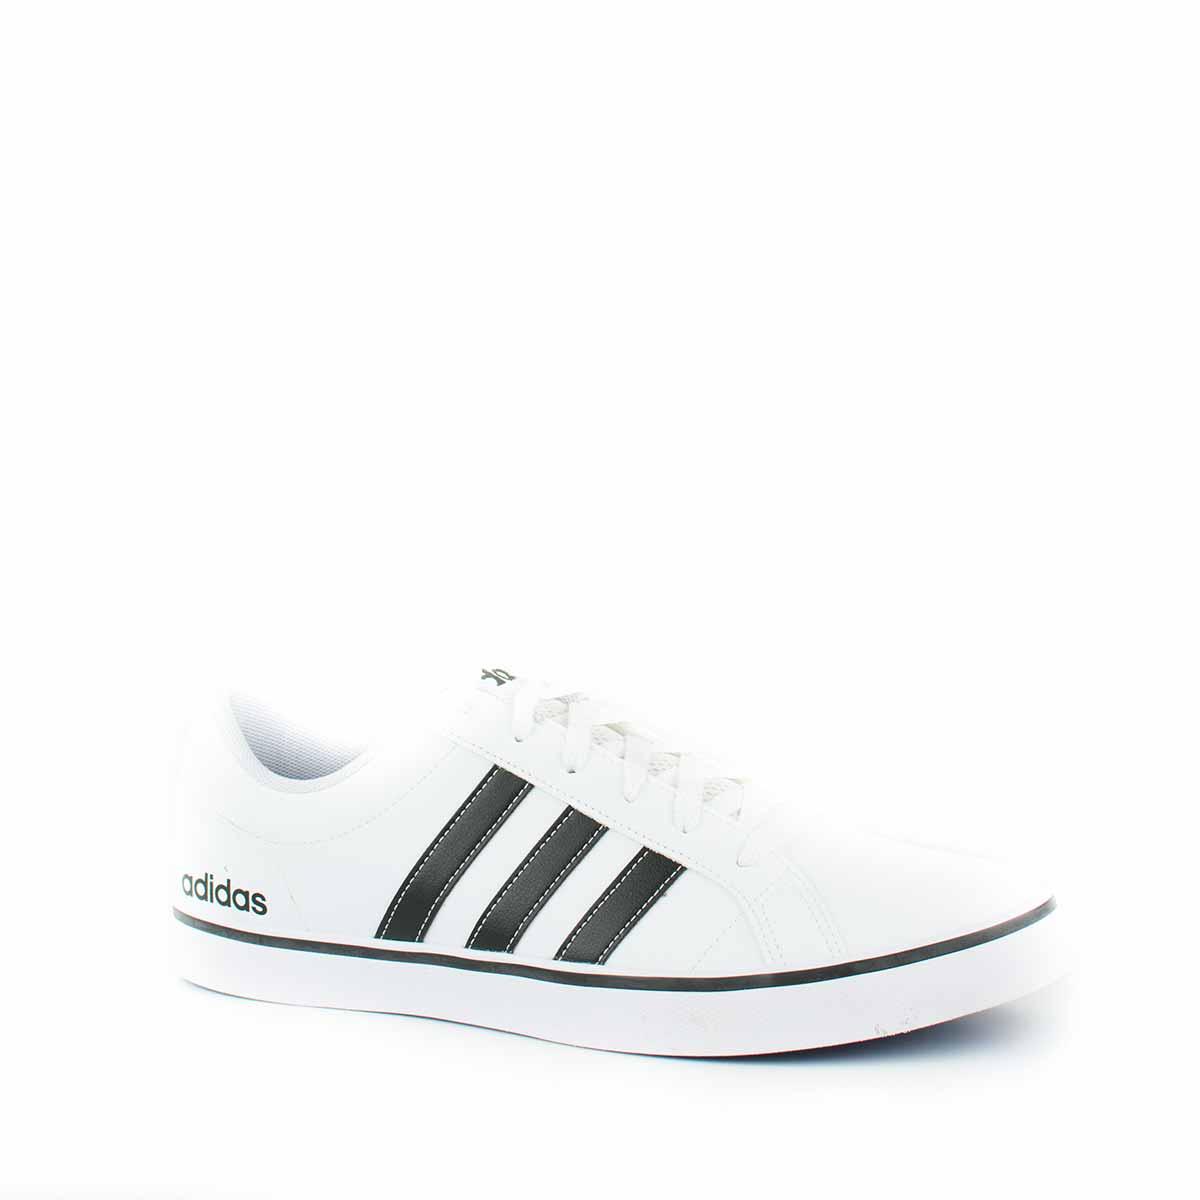 53d21794cb3d1 Tênis Casual Adidas Pace Vs Branco Preto. Referência  Adidas AW4594